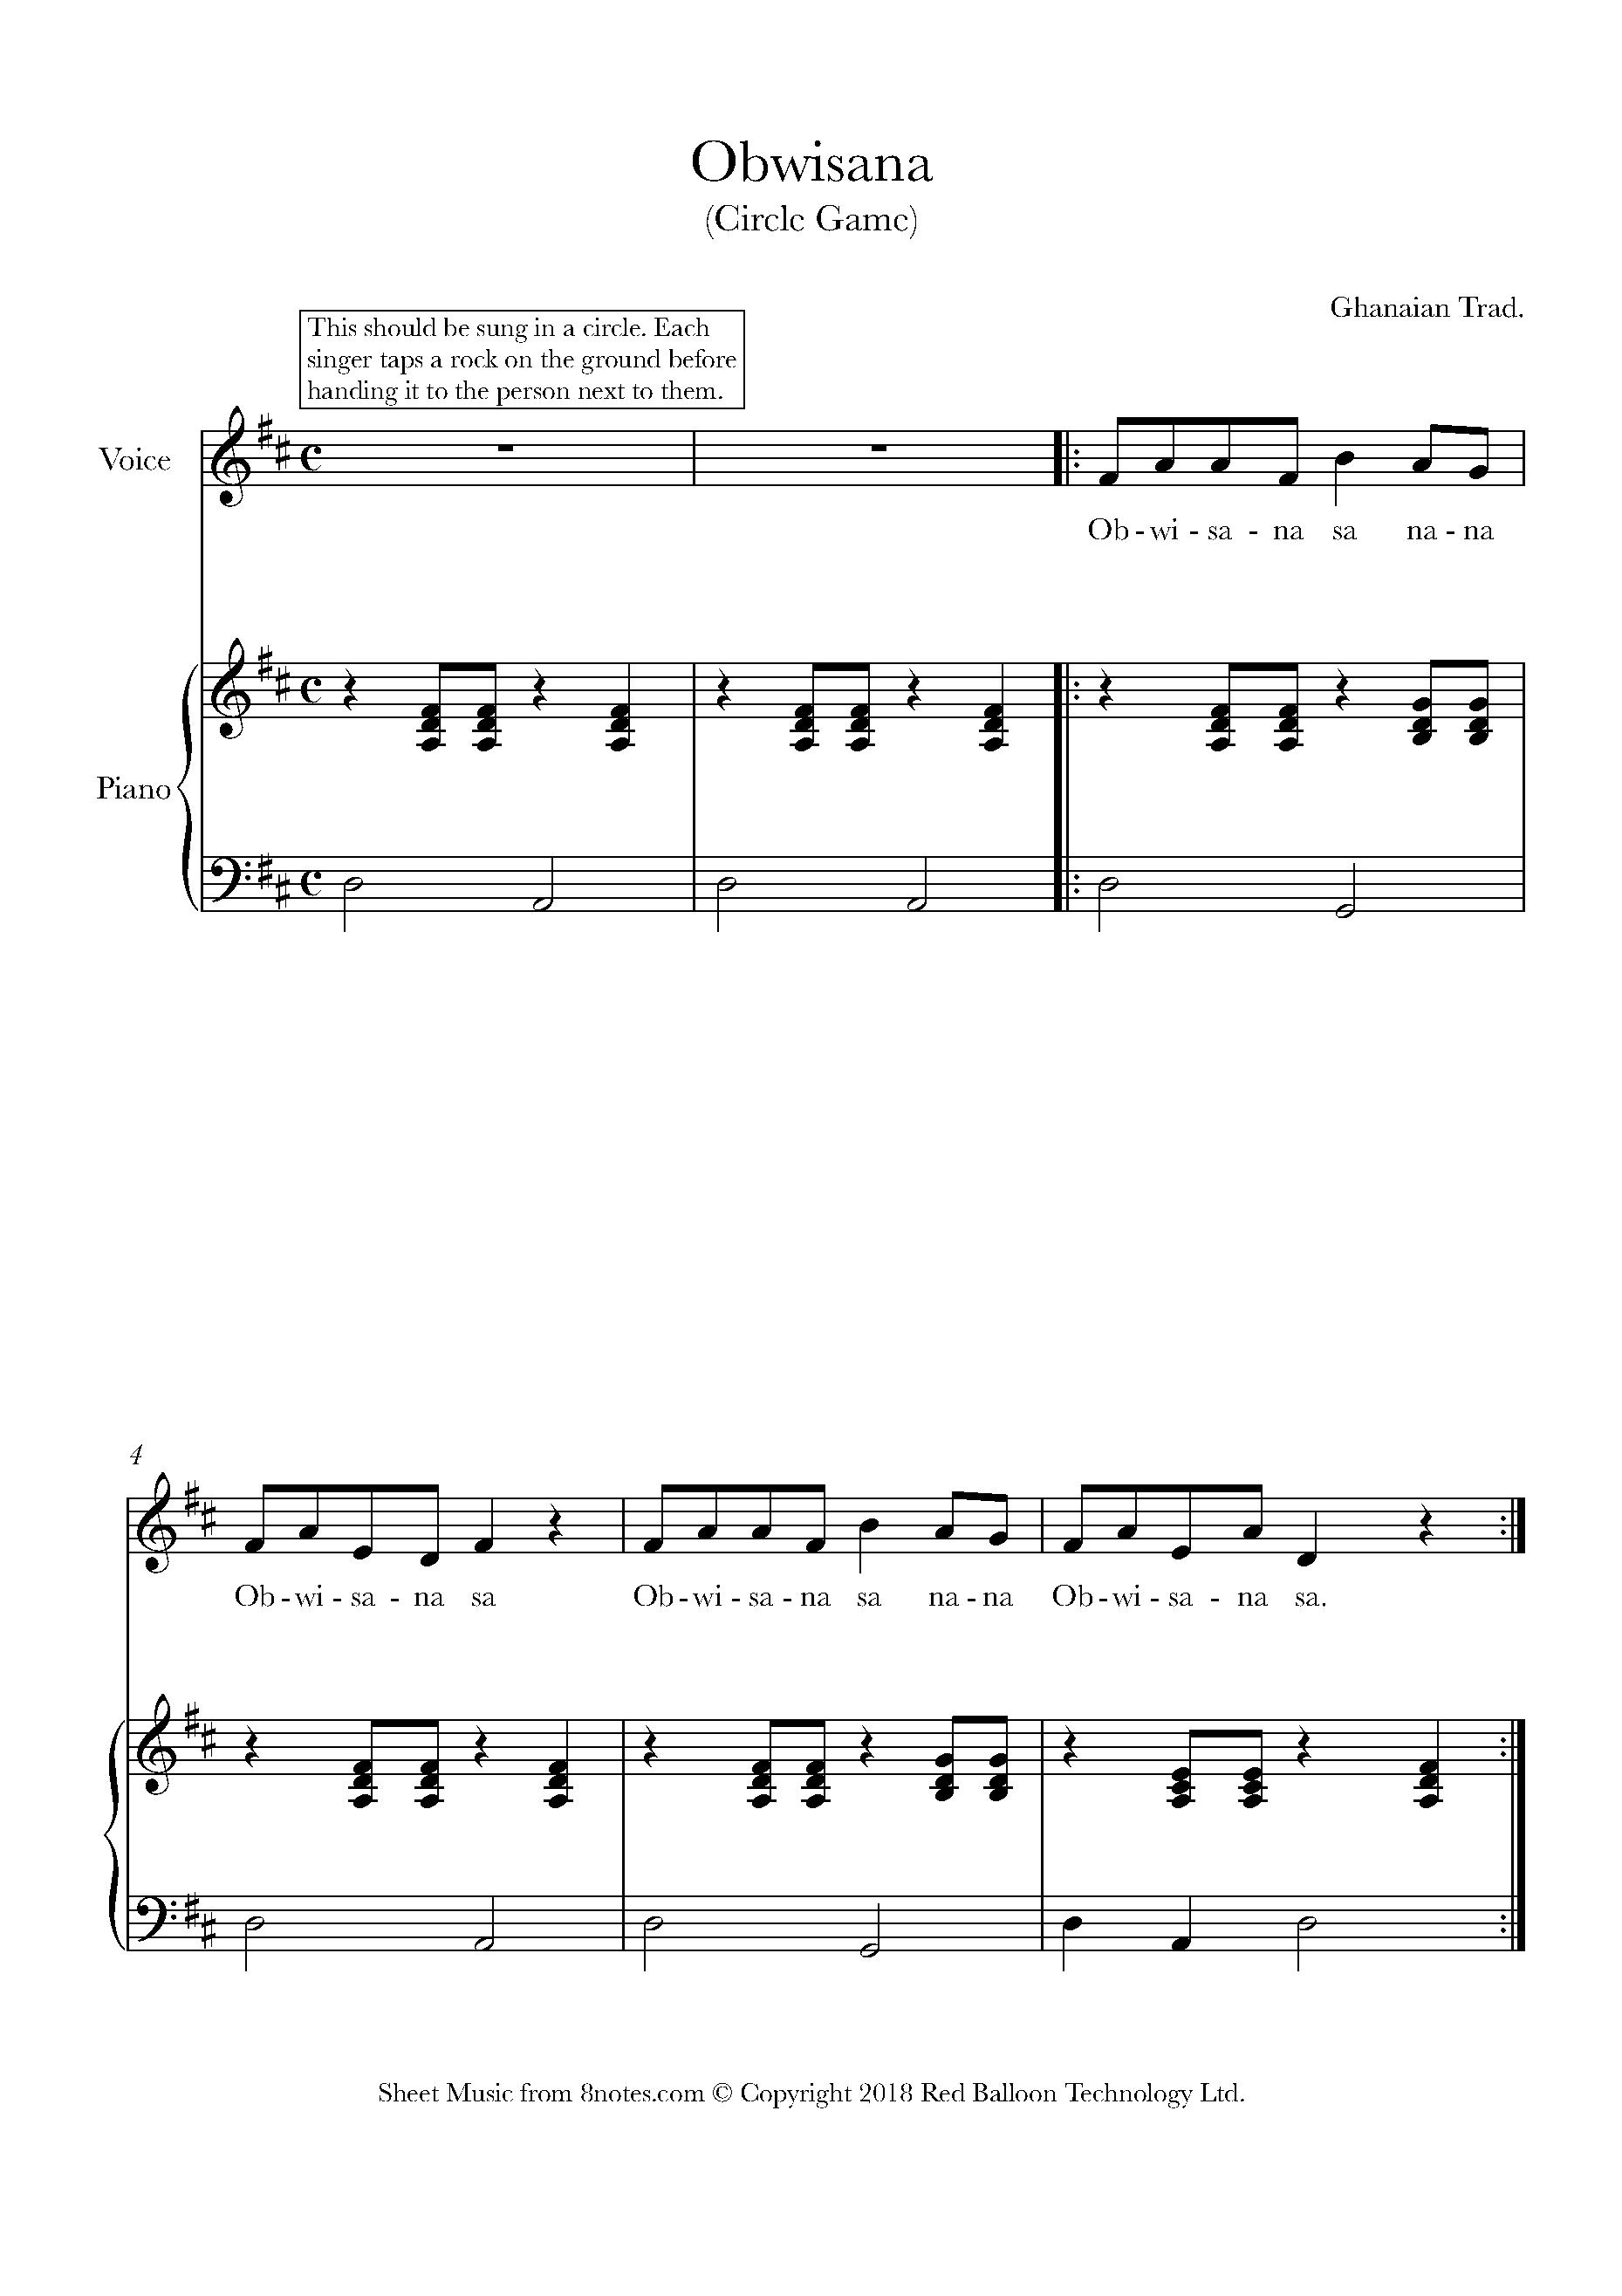 Obwisana : obwisana, Obwisana, Sheet, Music, Voice, 8notes.com